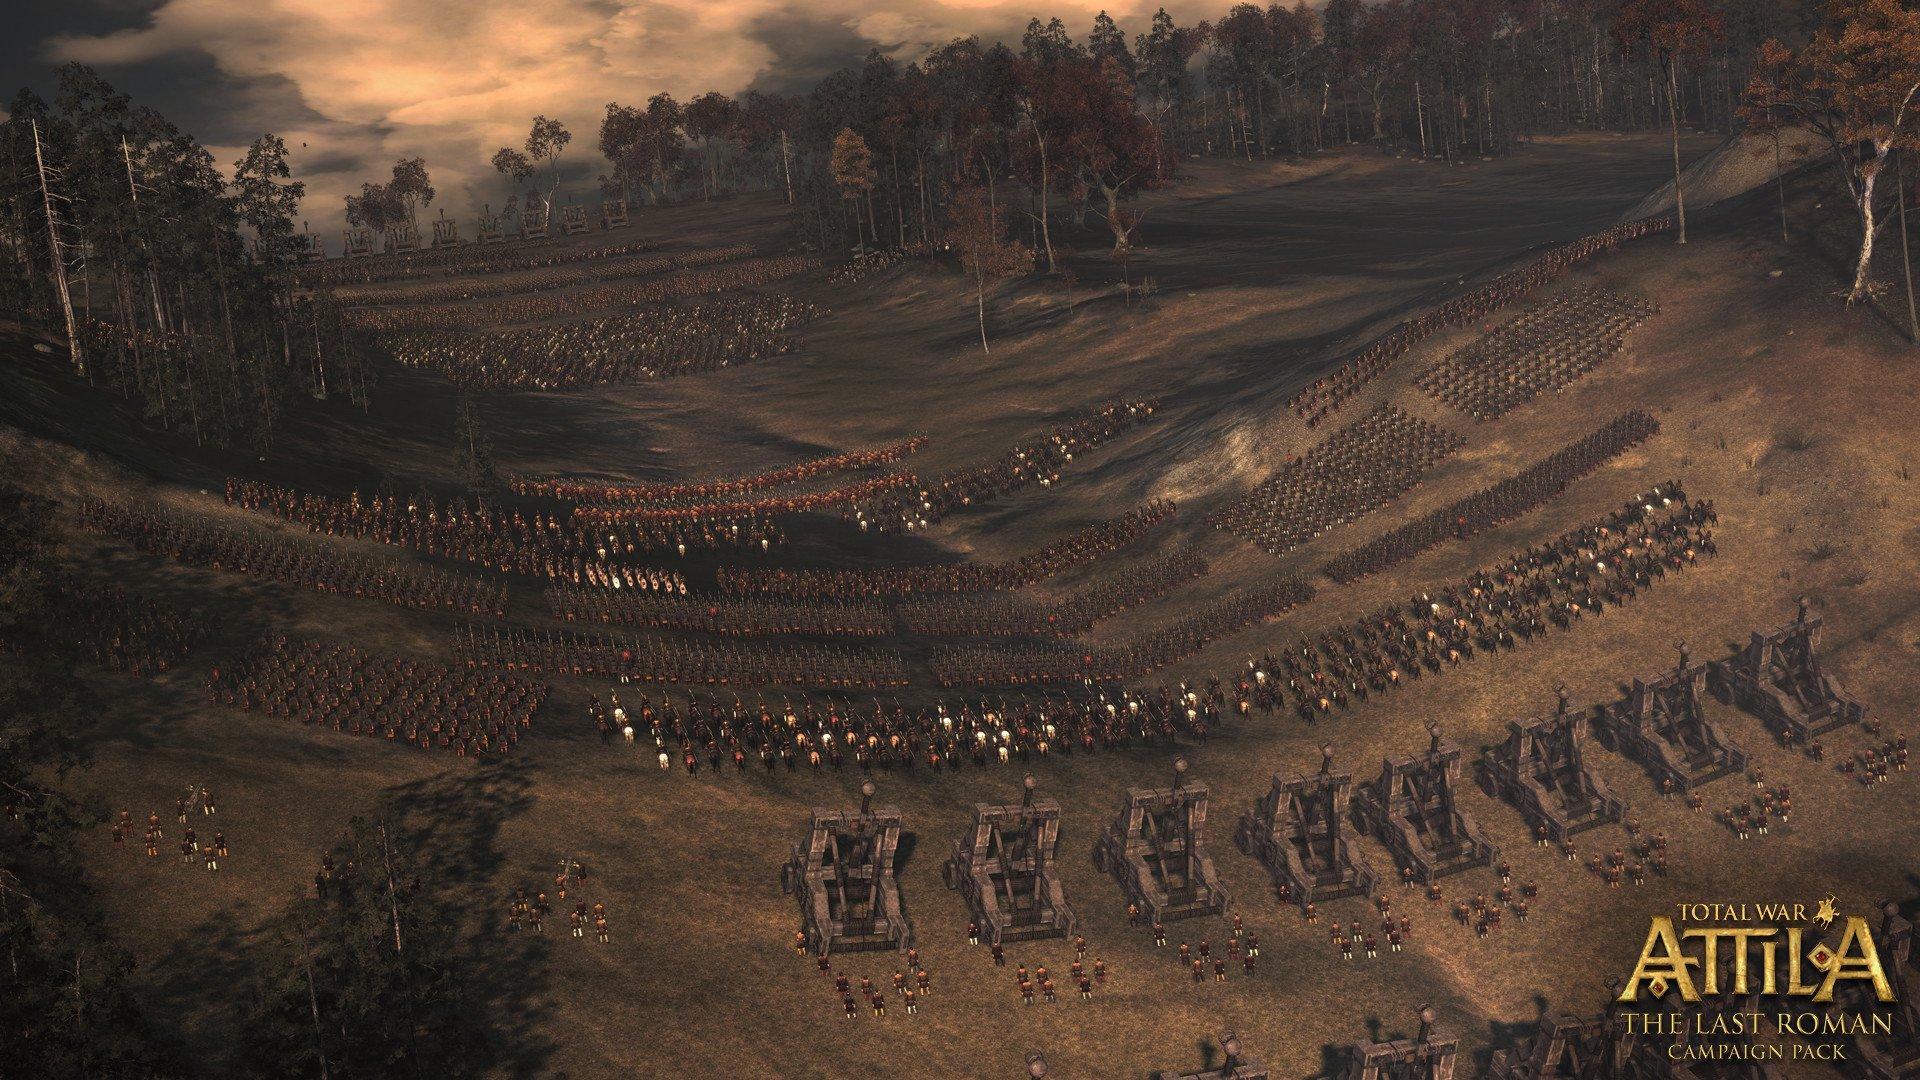 Total War ATTILA The Last Roman Campaign Pack 6